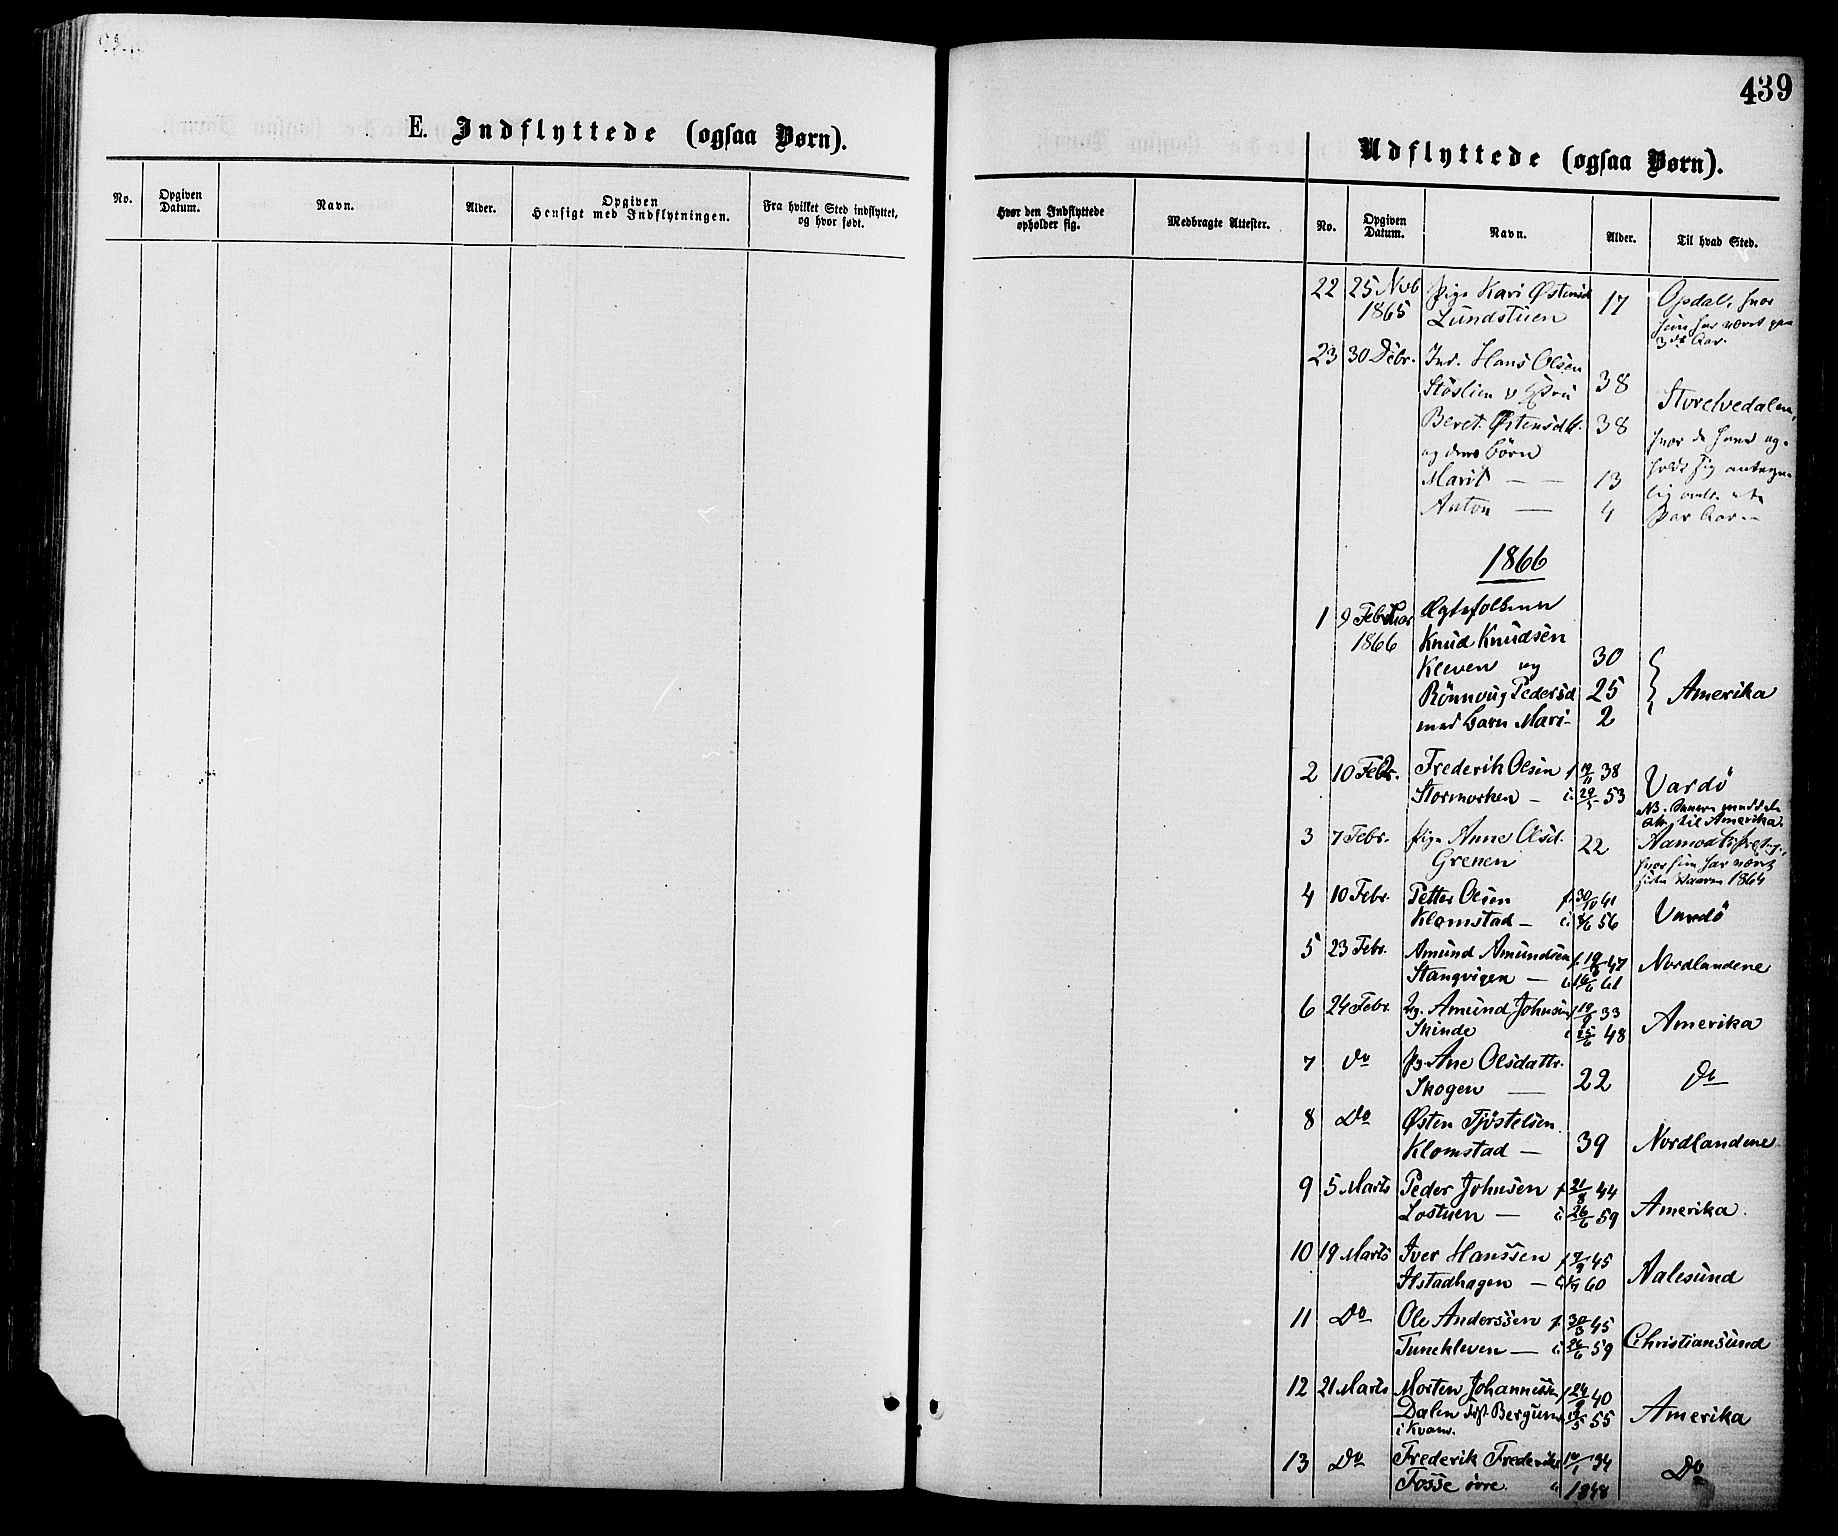 SAH, Nord-Fron prestekontor, Ministerialbok nr. 2, 1865-1883, s. 439